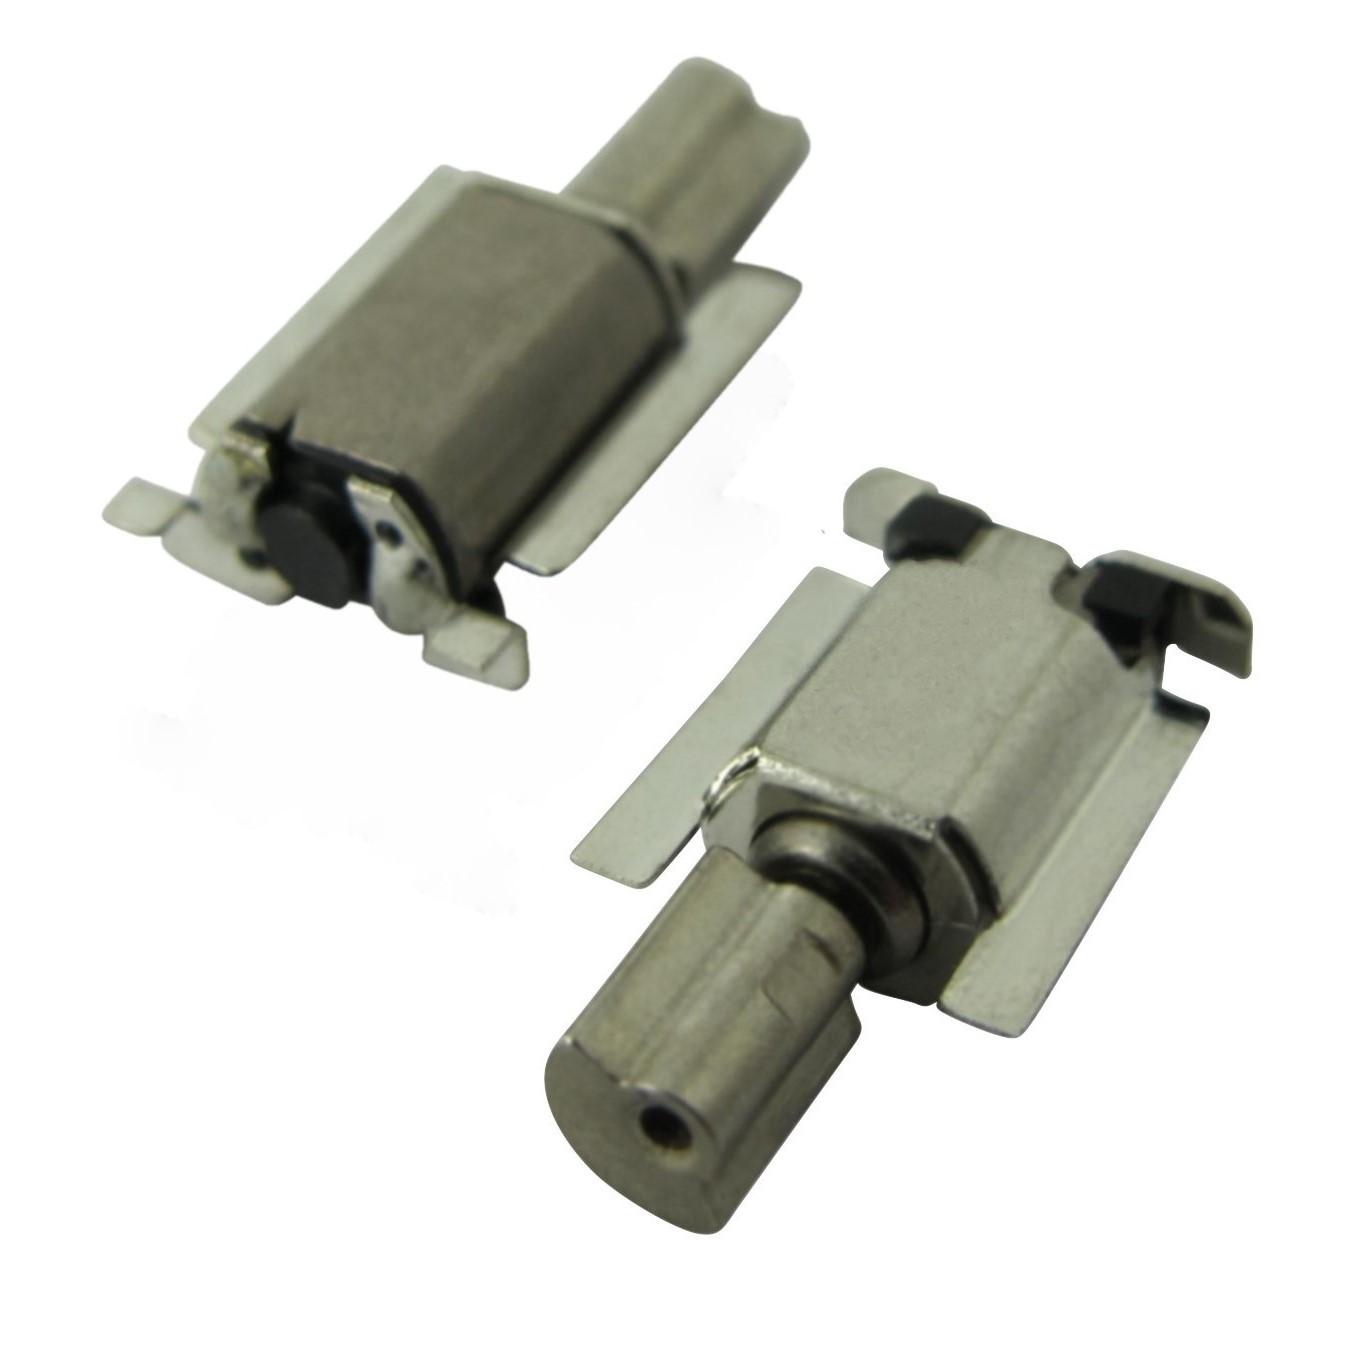 Z30C1B839981A Cylindrical Vibrator Motor